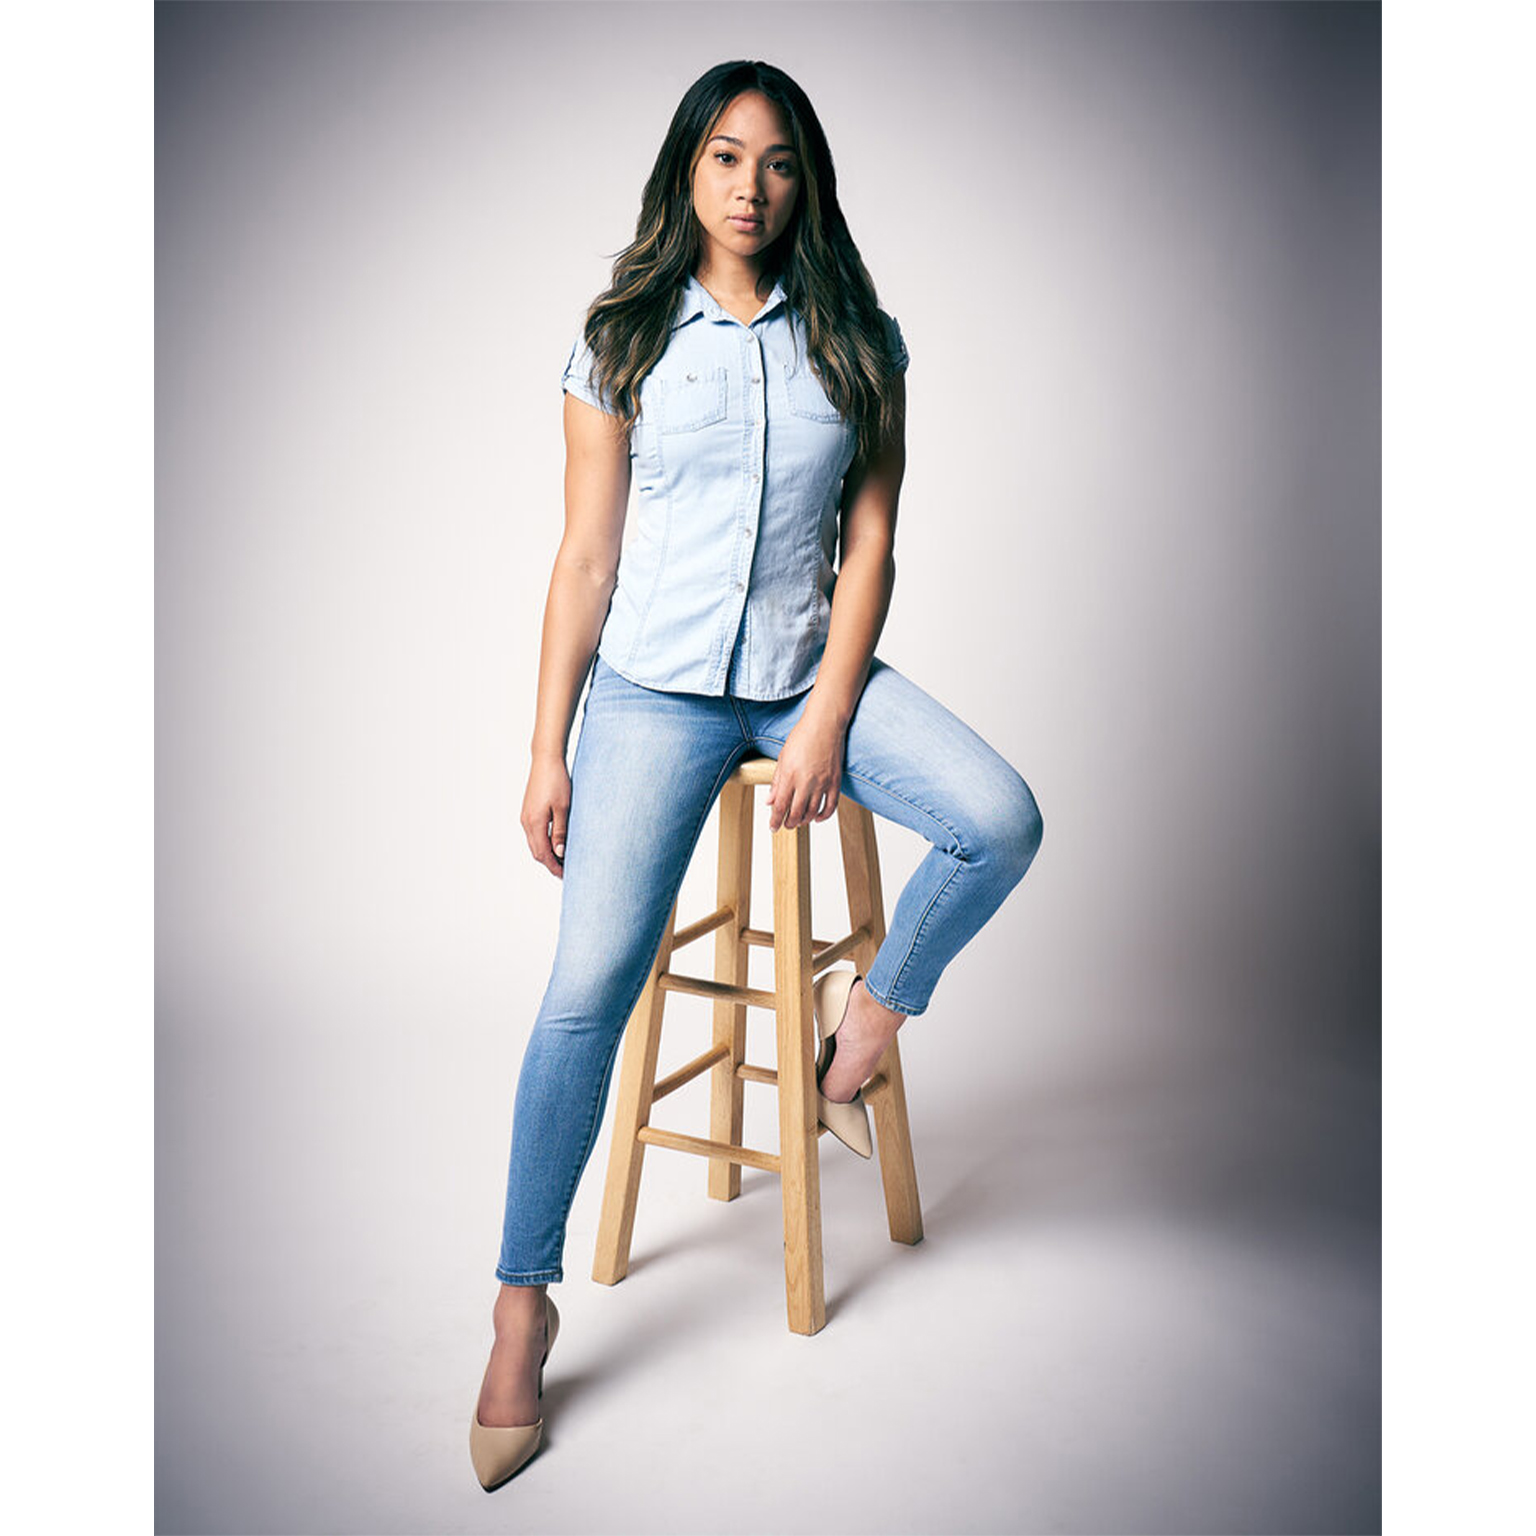 Toronto Fitness Model Agency - Lifestyle Commercial Model - Alysia Thomasos 5